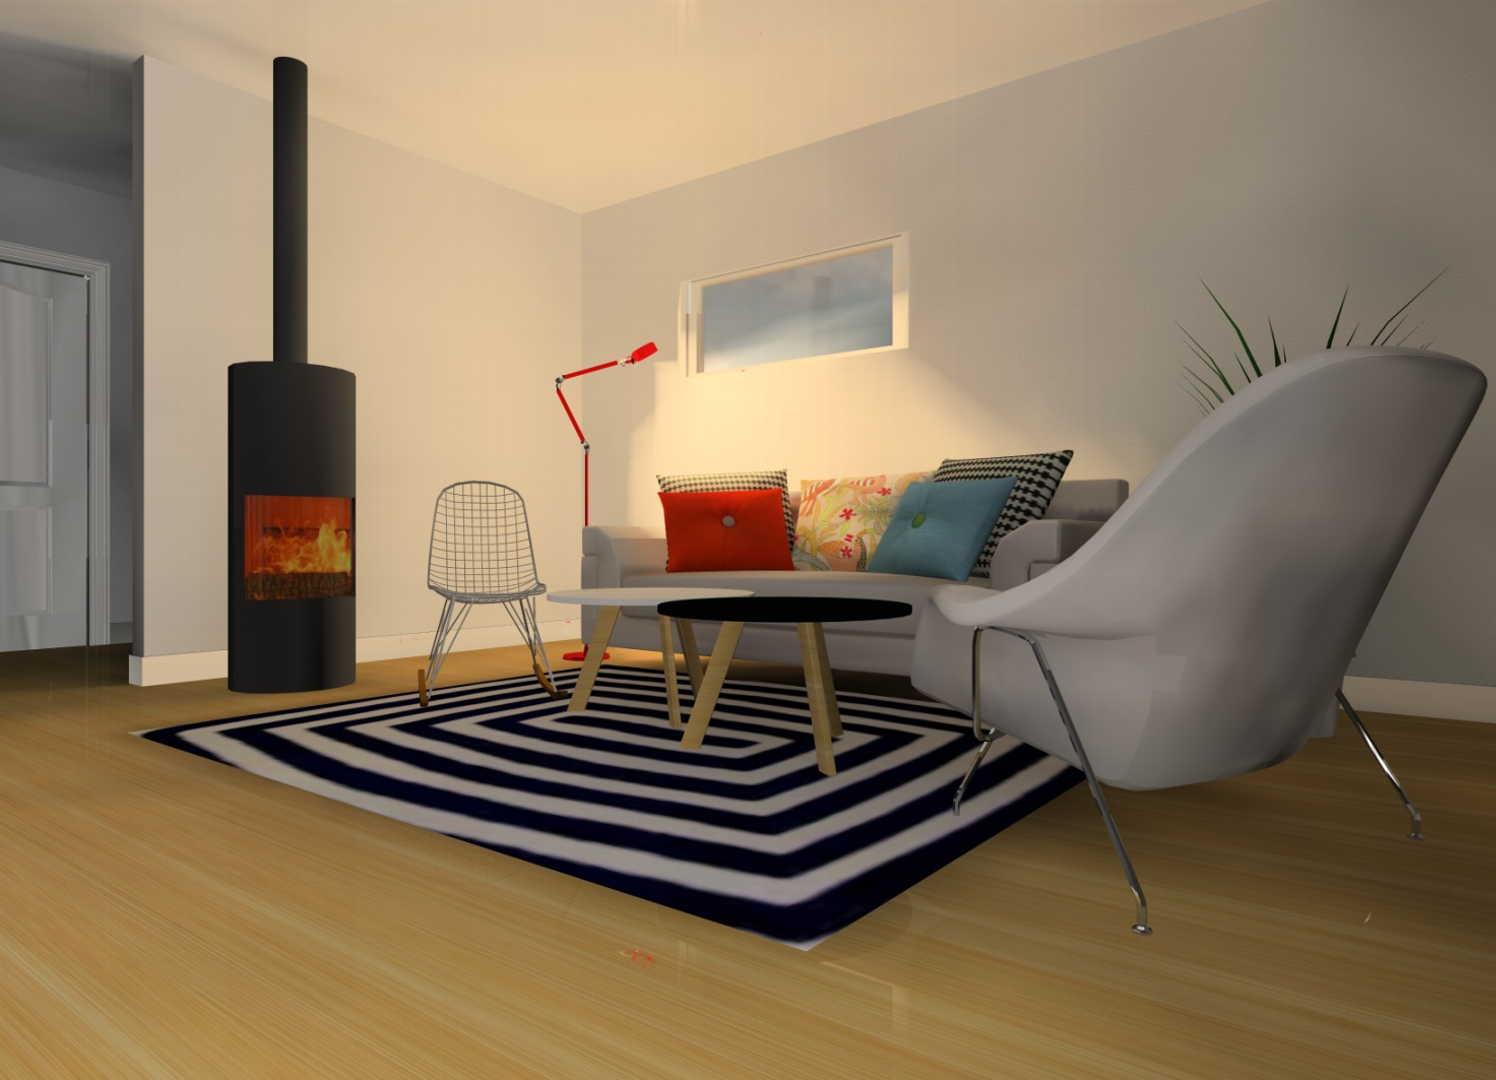 Moderni olohuone keittiö, Sisustussuunnitelma  olohuone